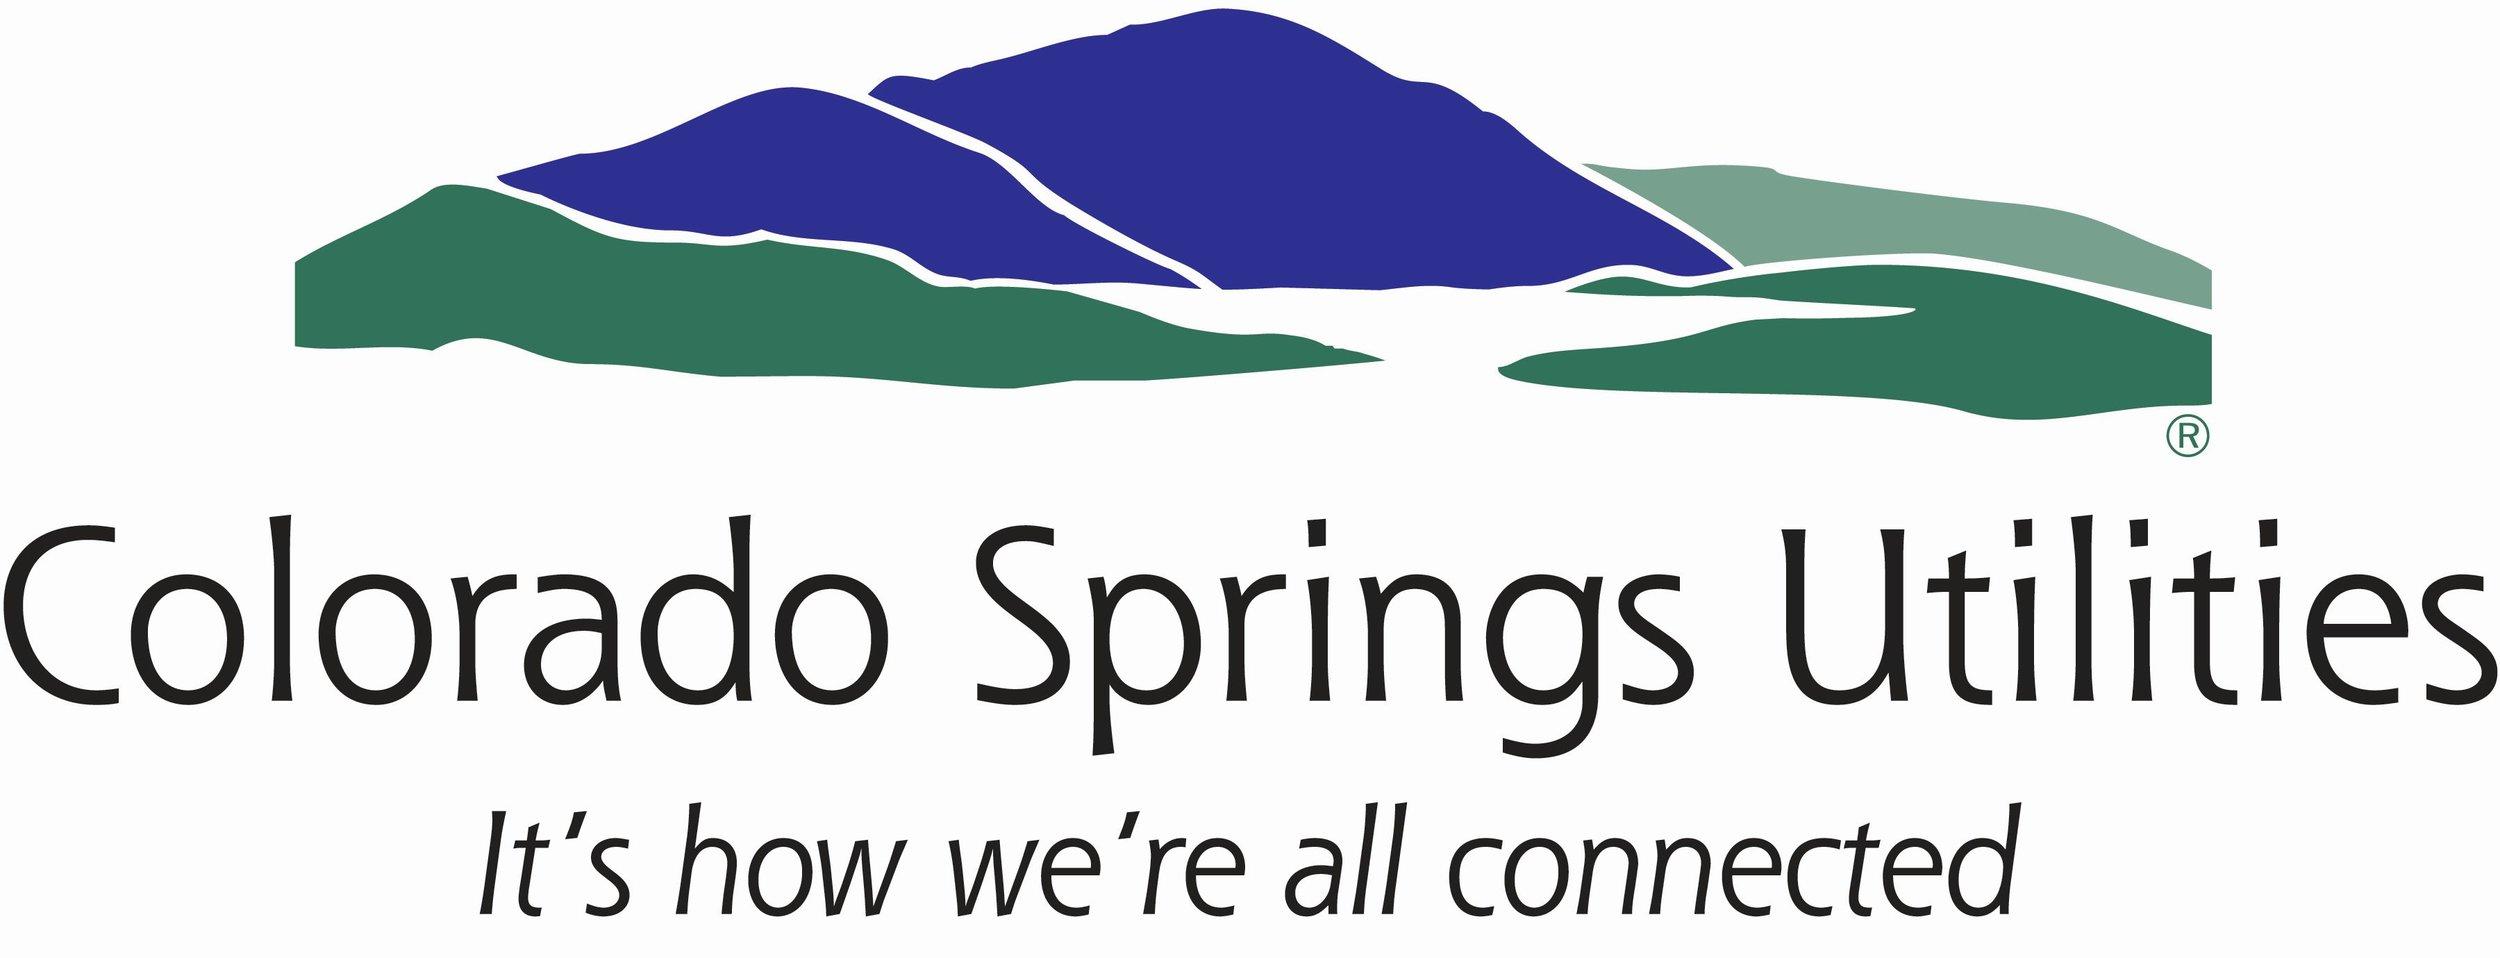 Colorado-Springs-Utilities-Logo.jpg